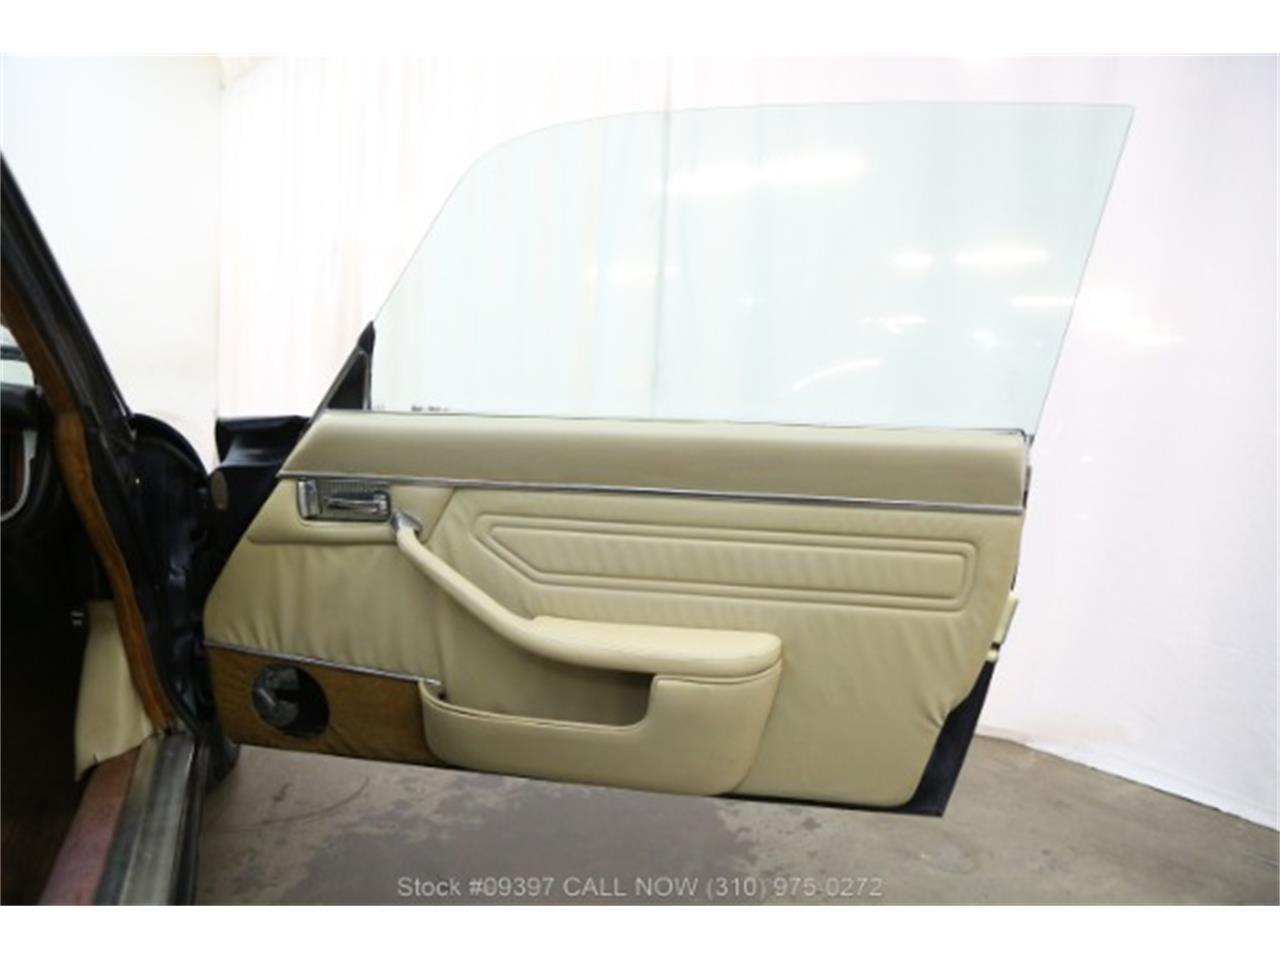 Large Picture of '75 Jaguar XJ6 located in California - $10,750.00 - MZ7R